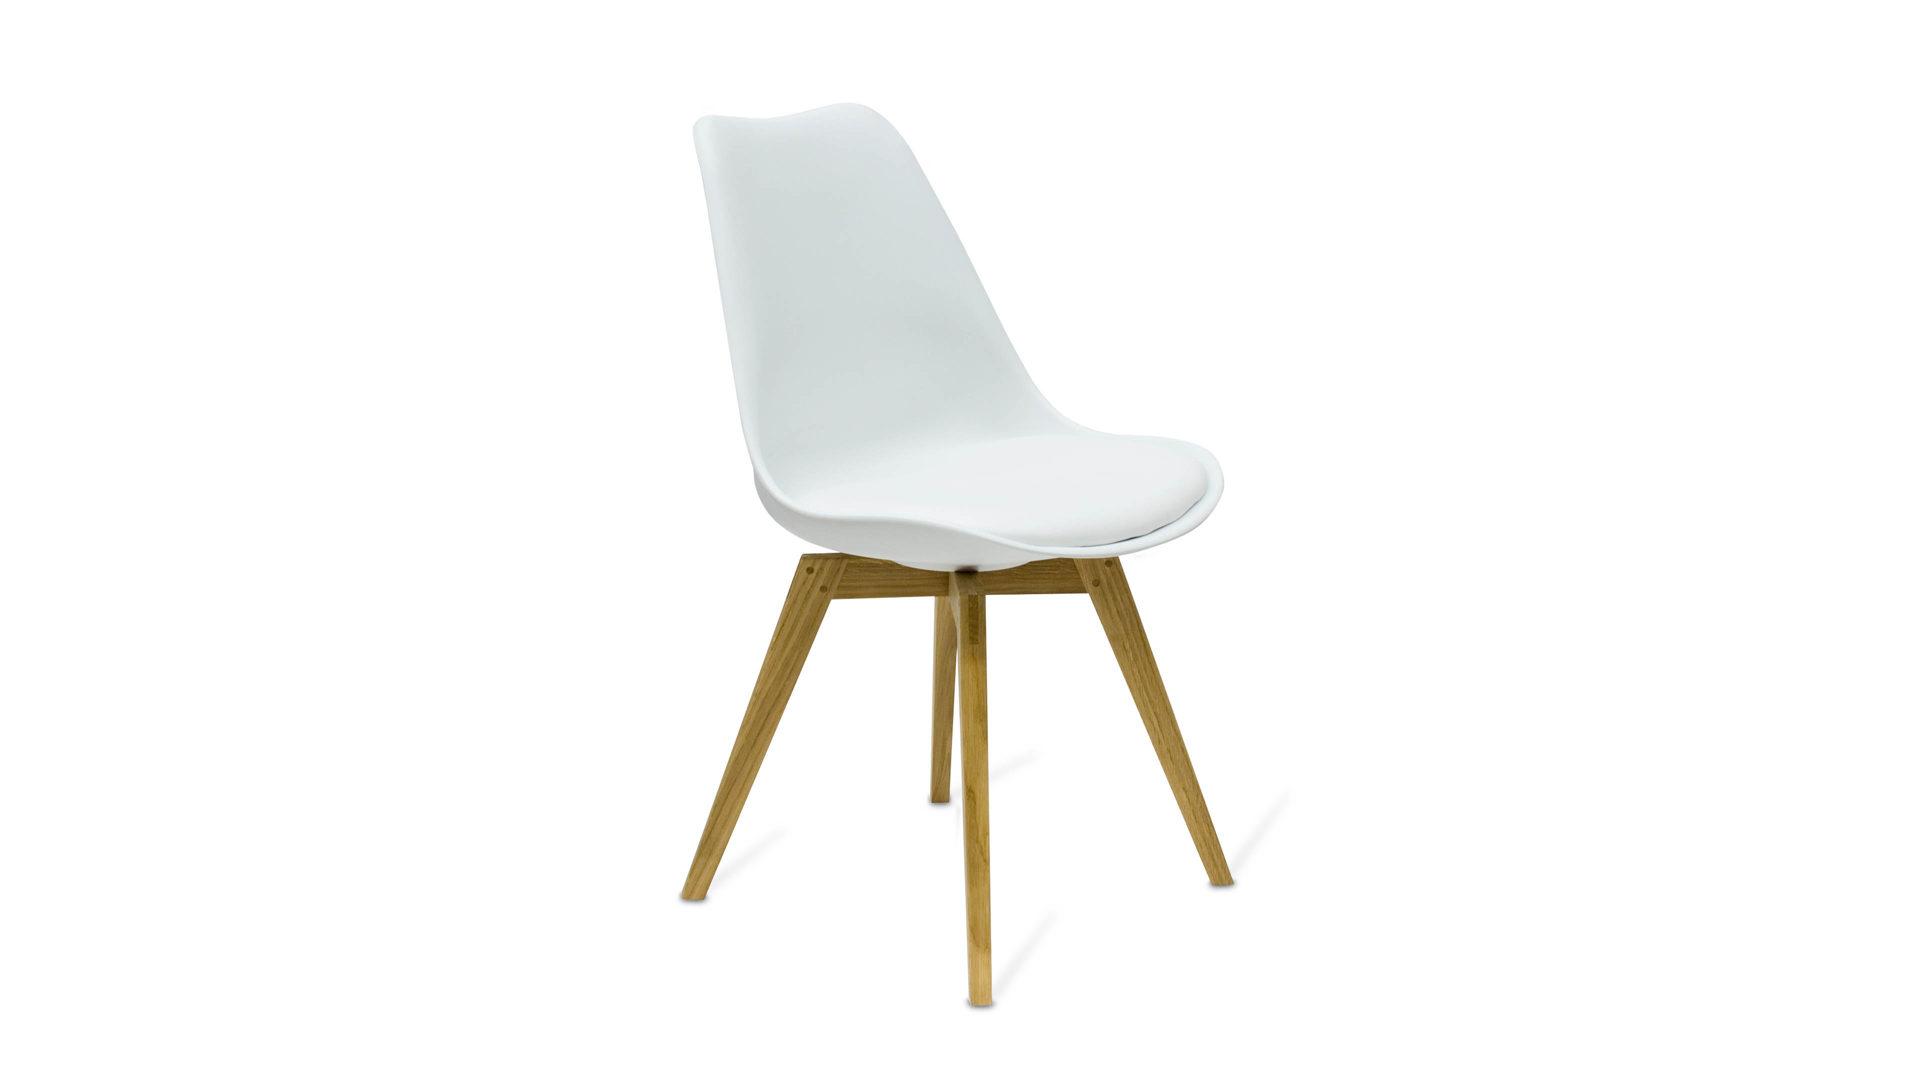 wei e st hle holz gunstig bettenlager fur metall stuhle und gepolst weis weisse l. Black Bedroom Furniture Sets. Home Design Ideas